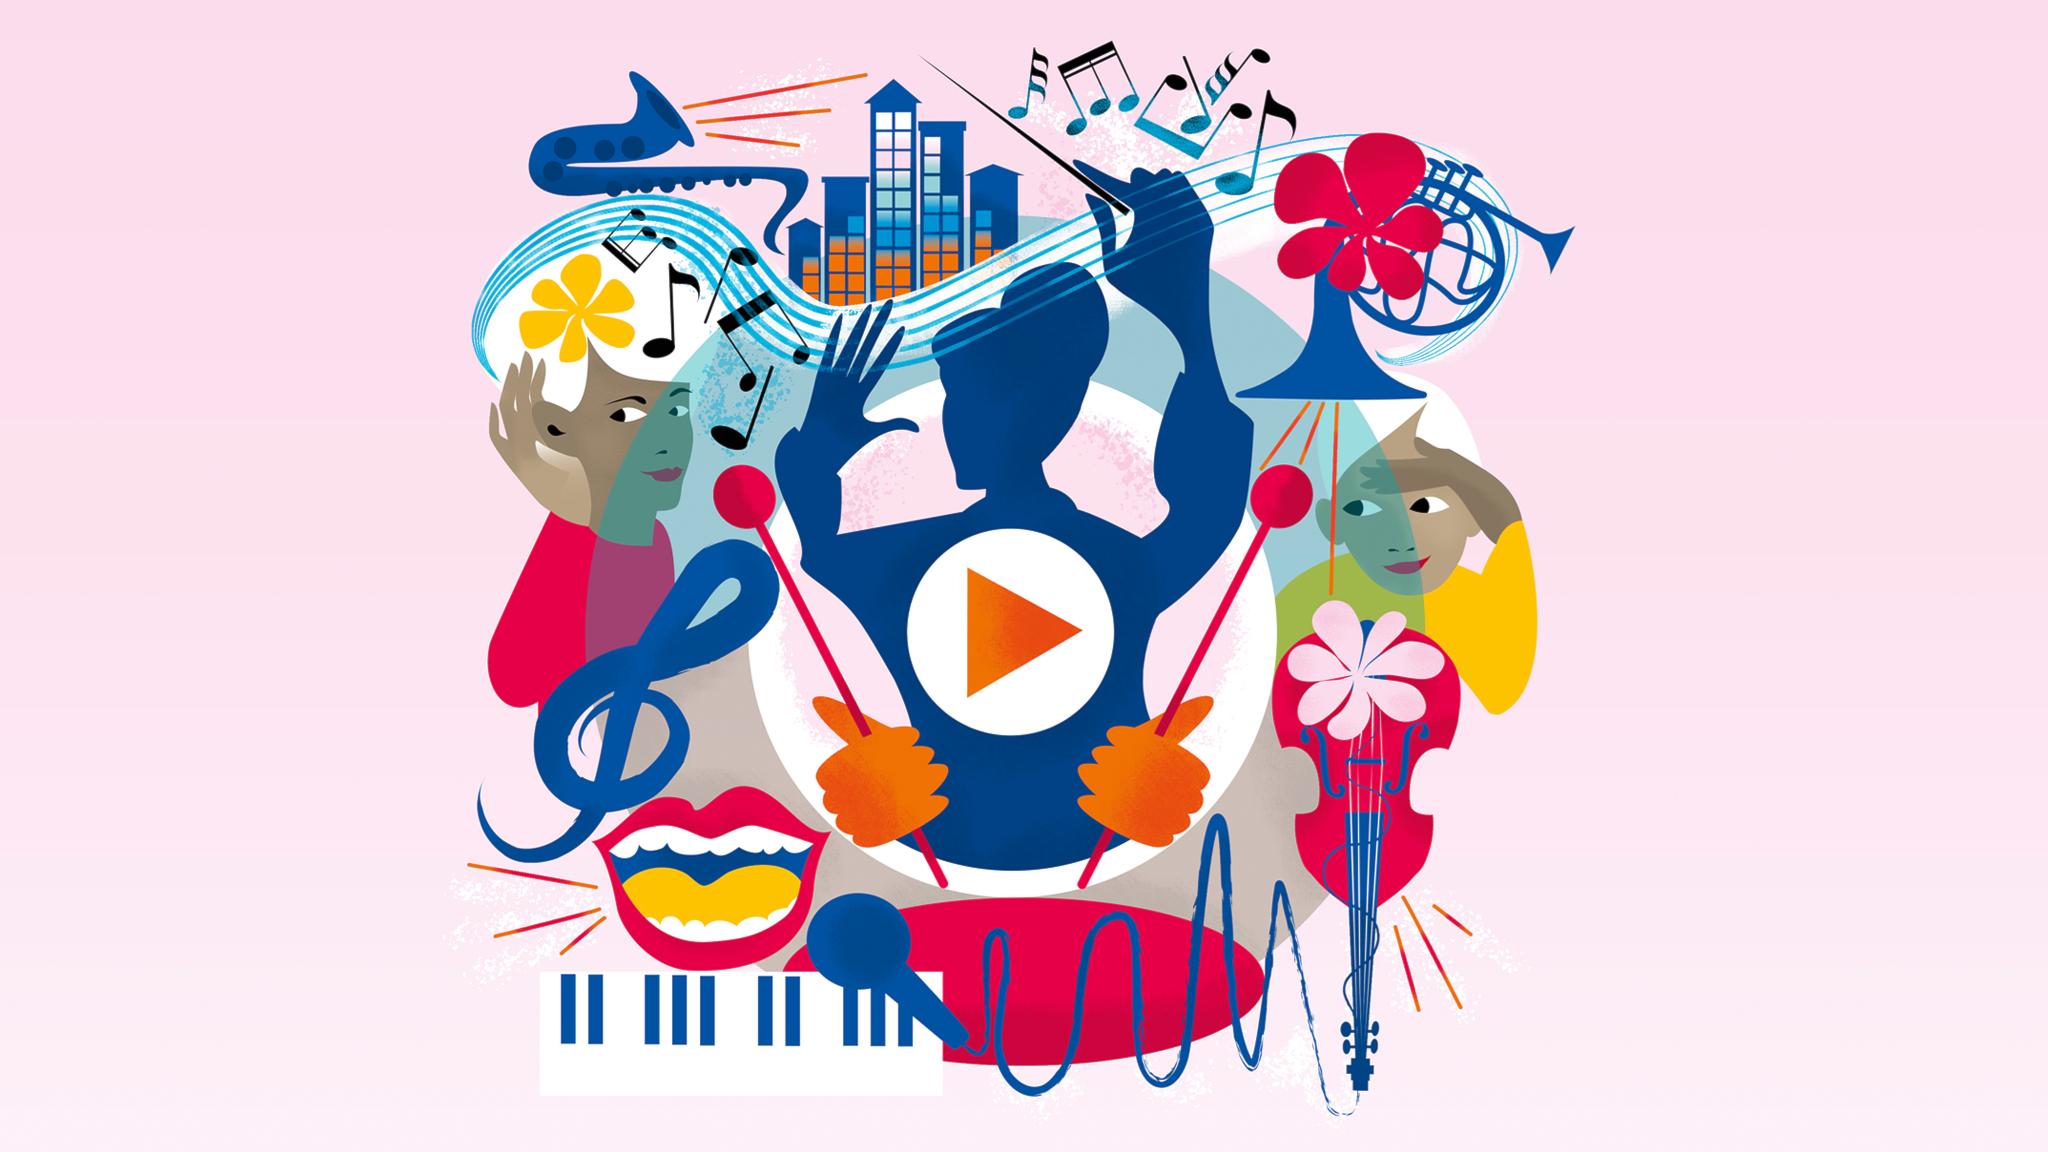 Var Anonymus Fru Musica? Del 2